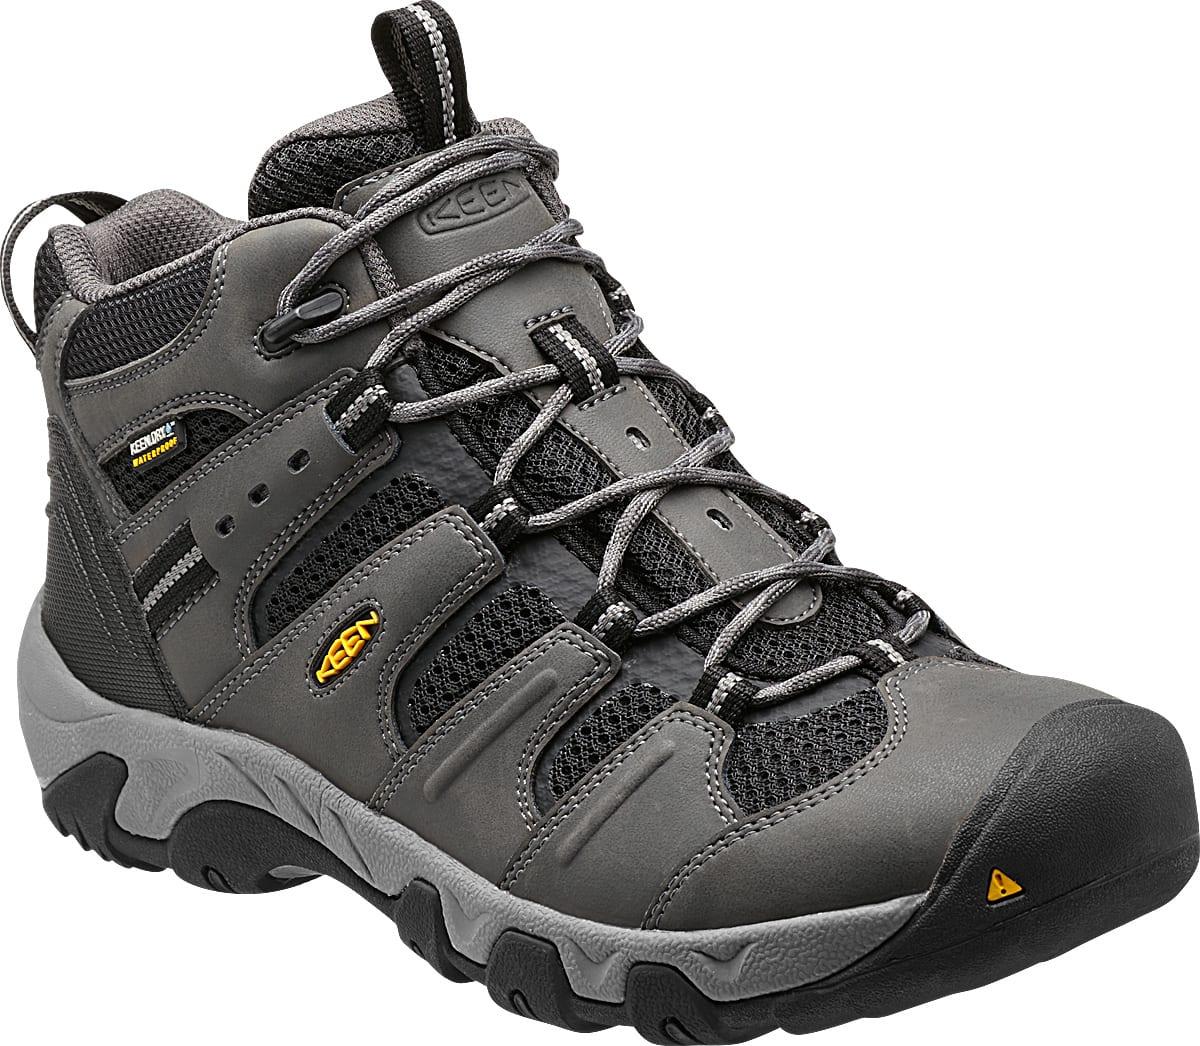 Keen Koven Mid WP Hiking Boots  thumbnail 2